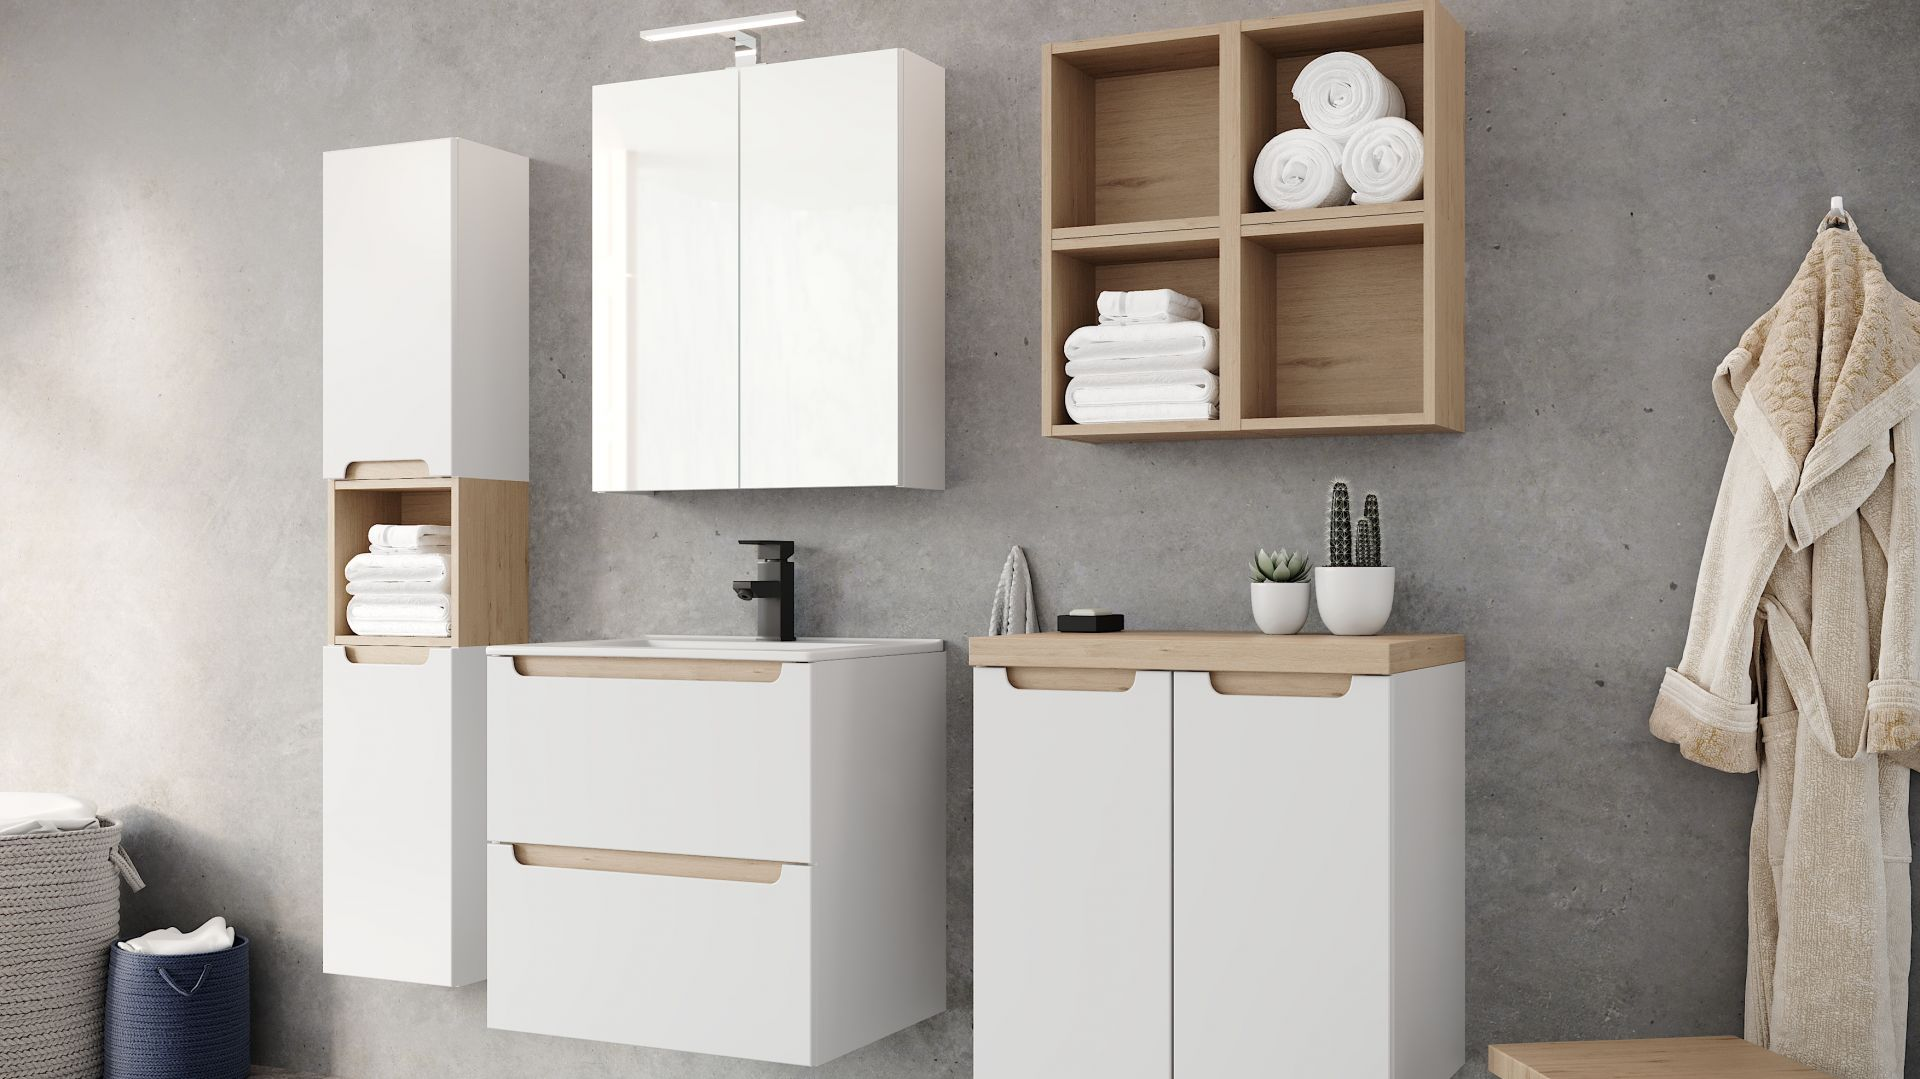 Nowoczesne meble łazienkowe z kolekcji Stilla marki Ø NAS. Fot. Deftrans